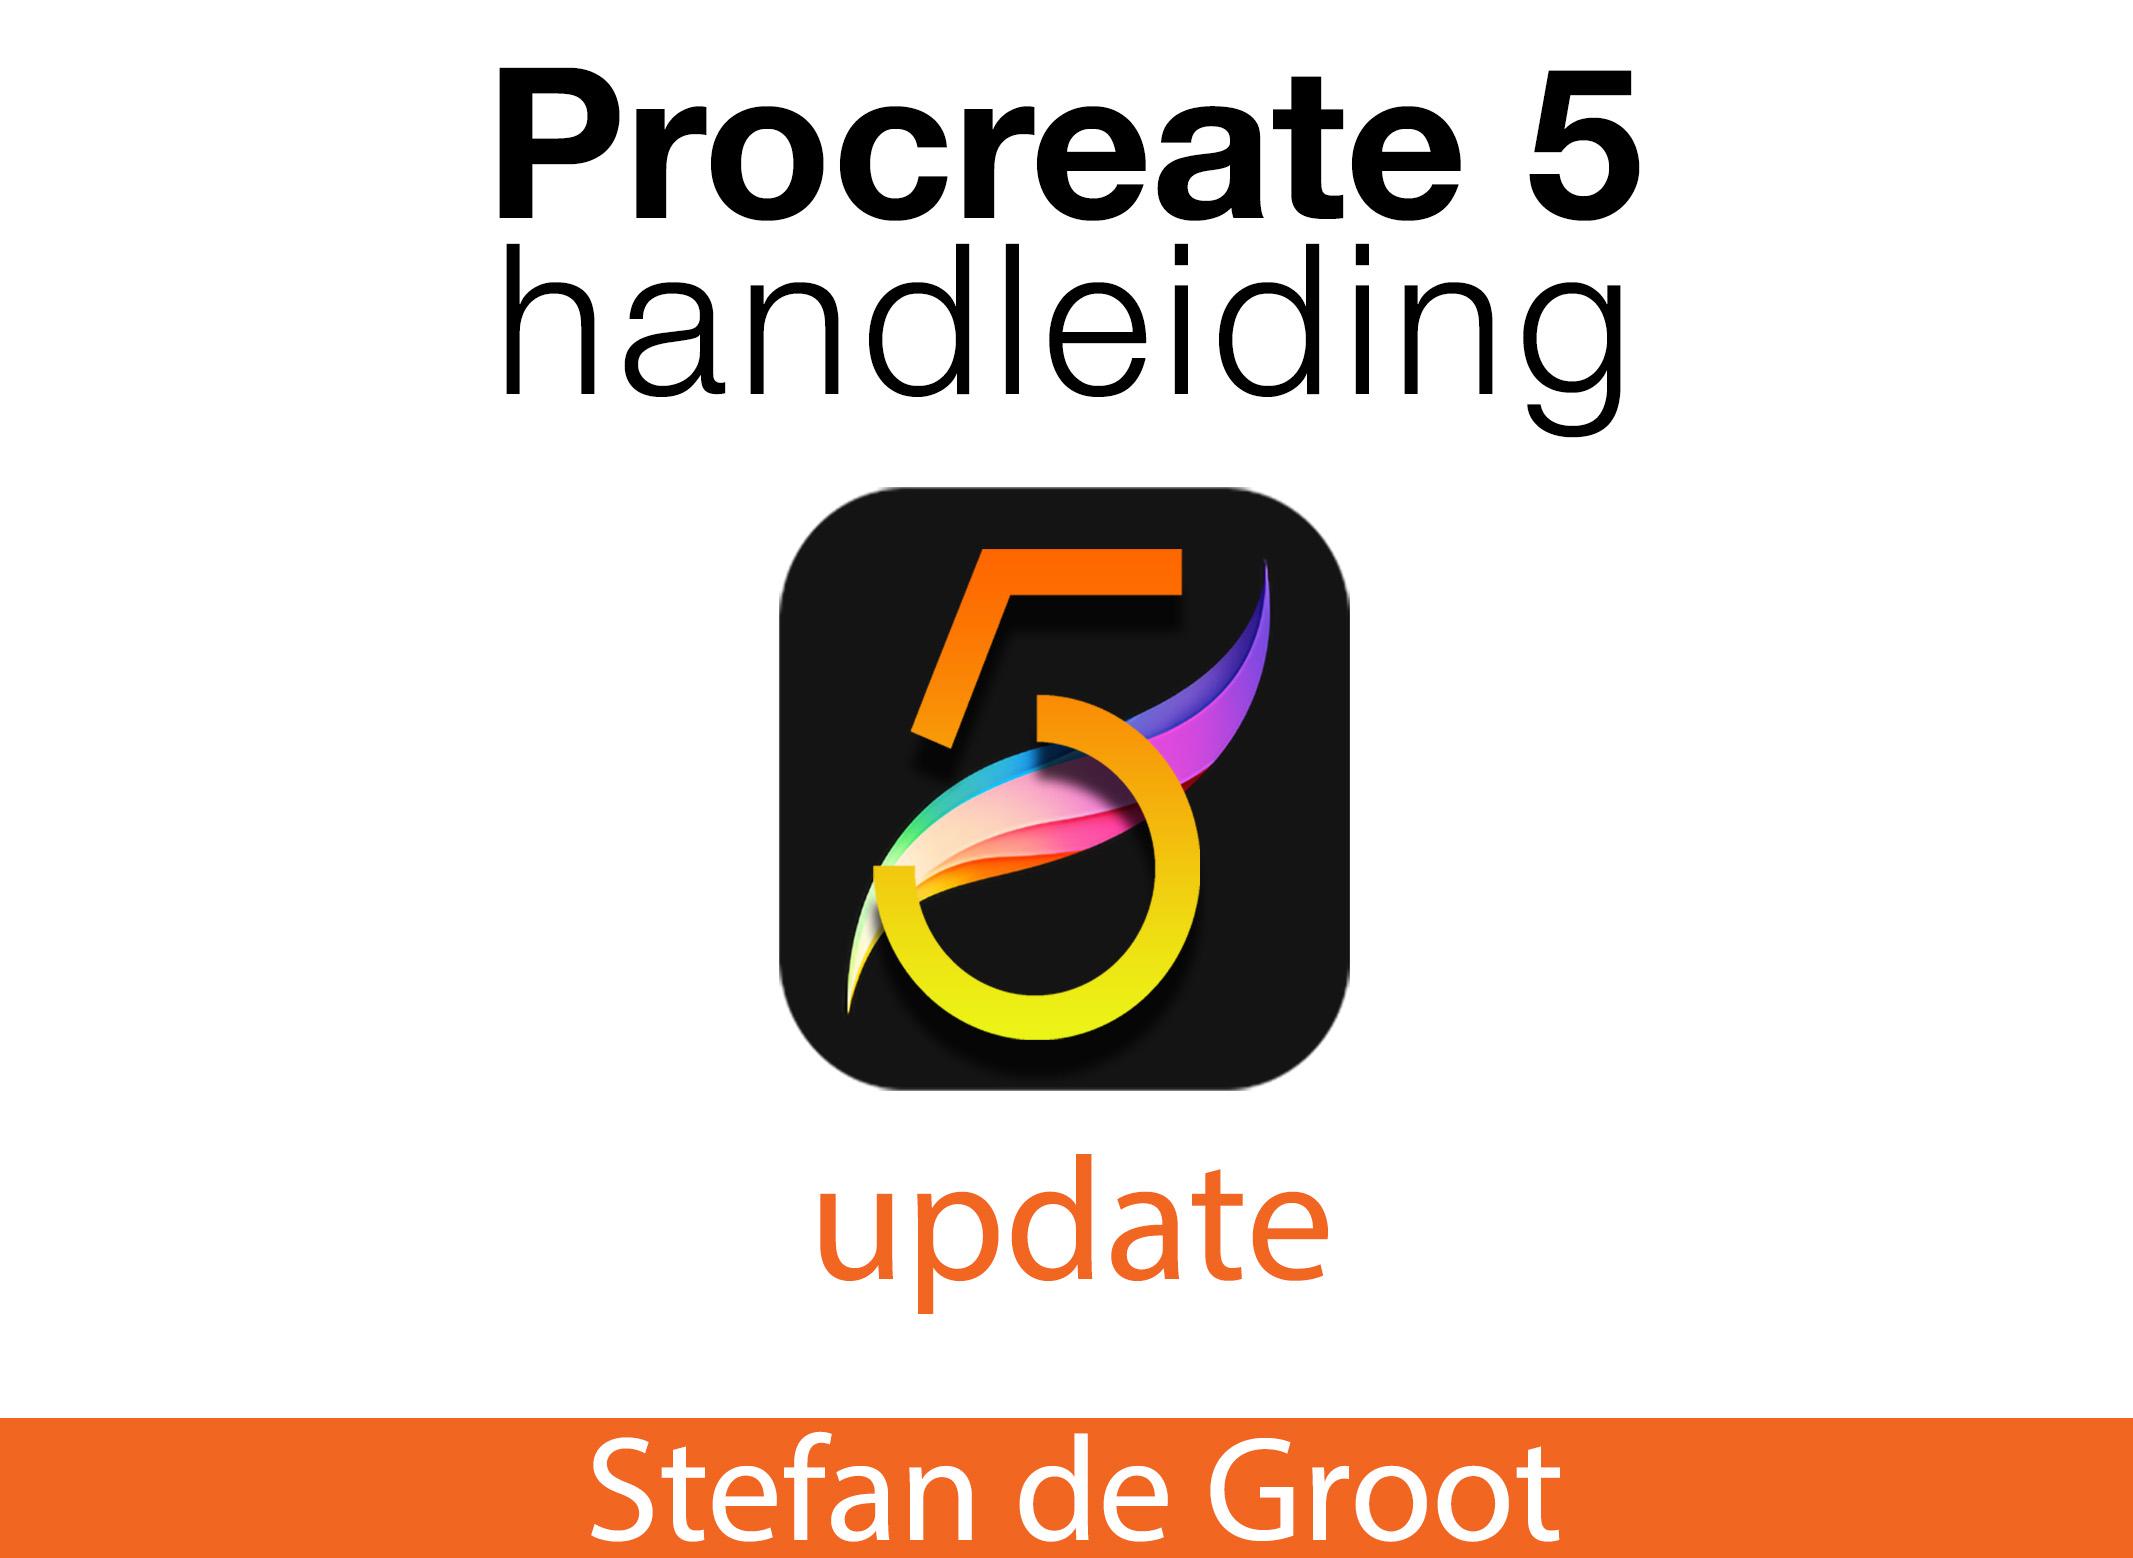 Procreate 5 Handleiding Update